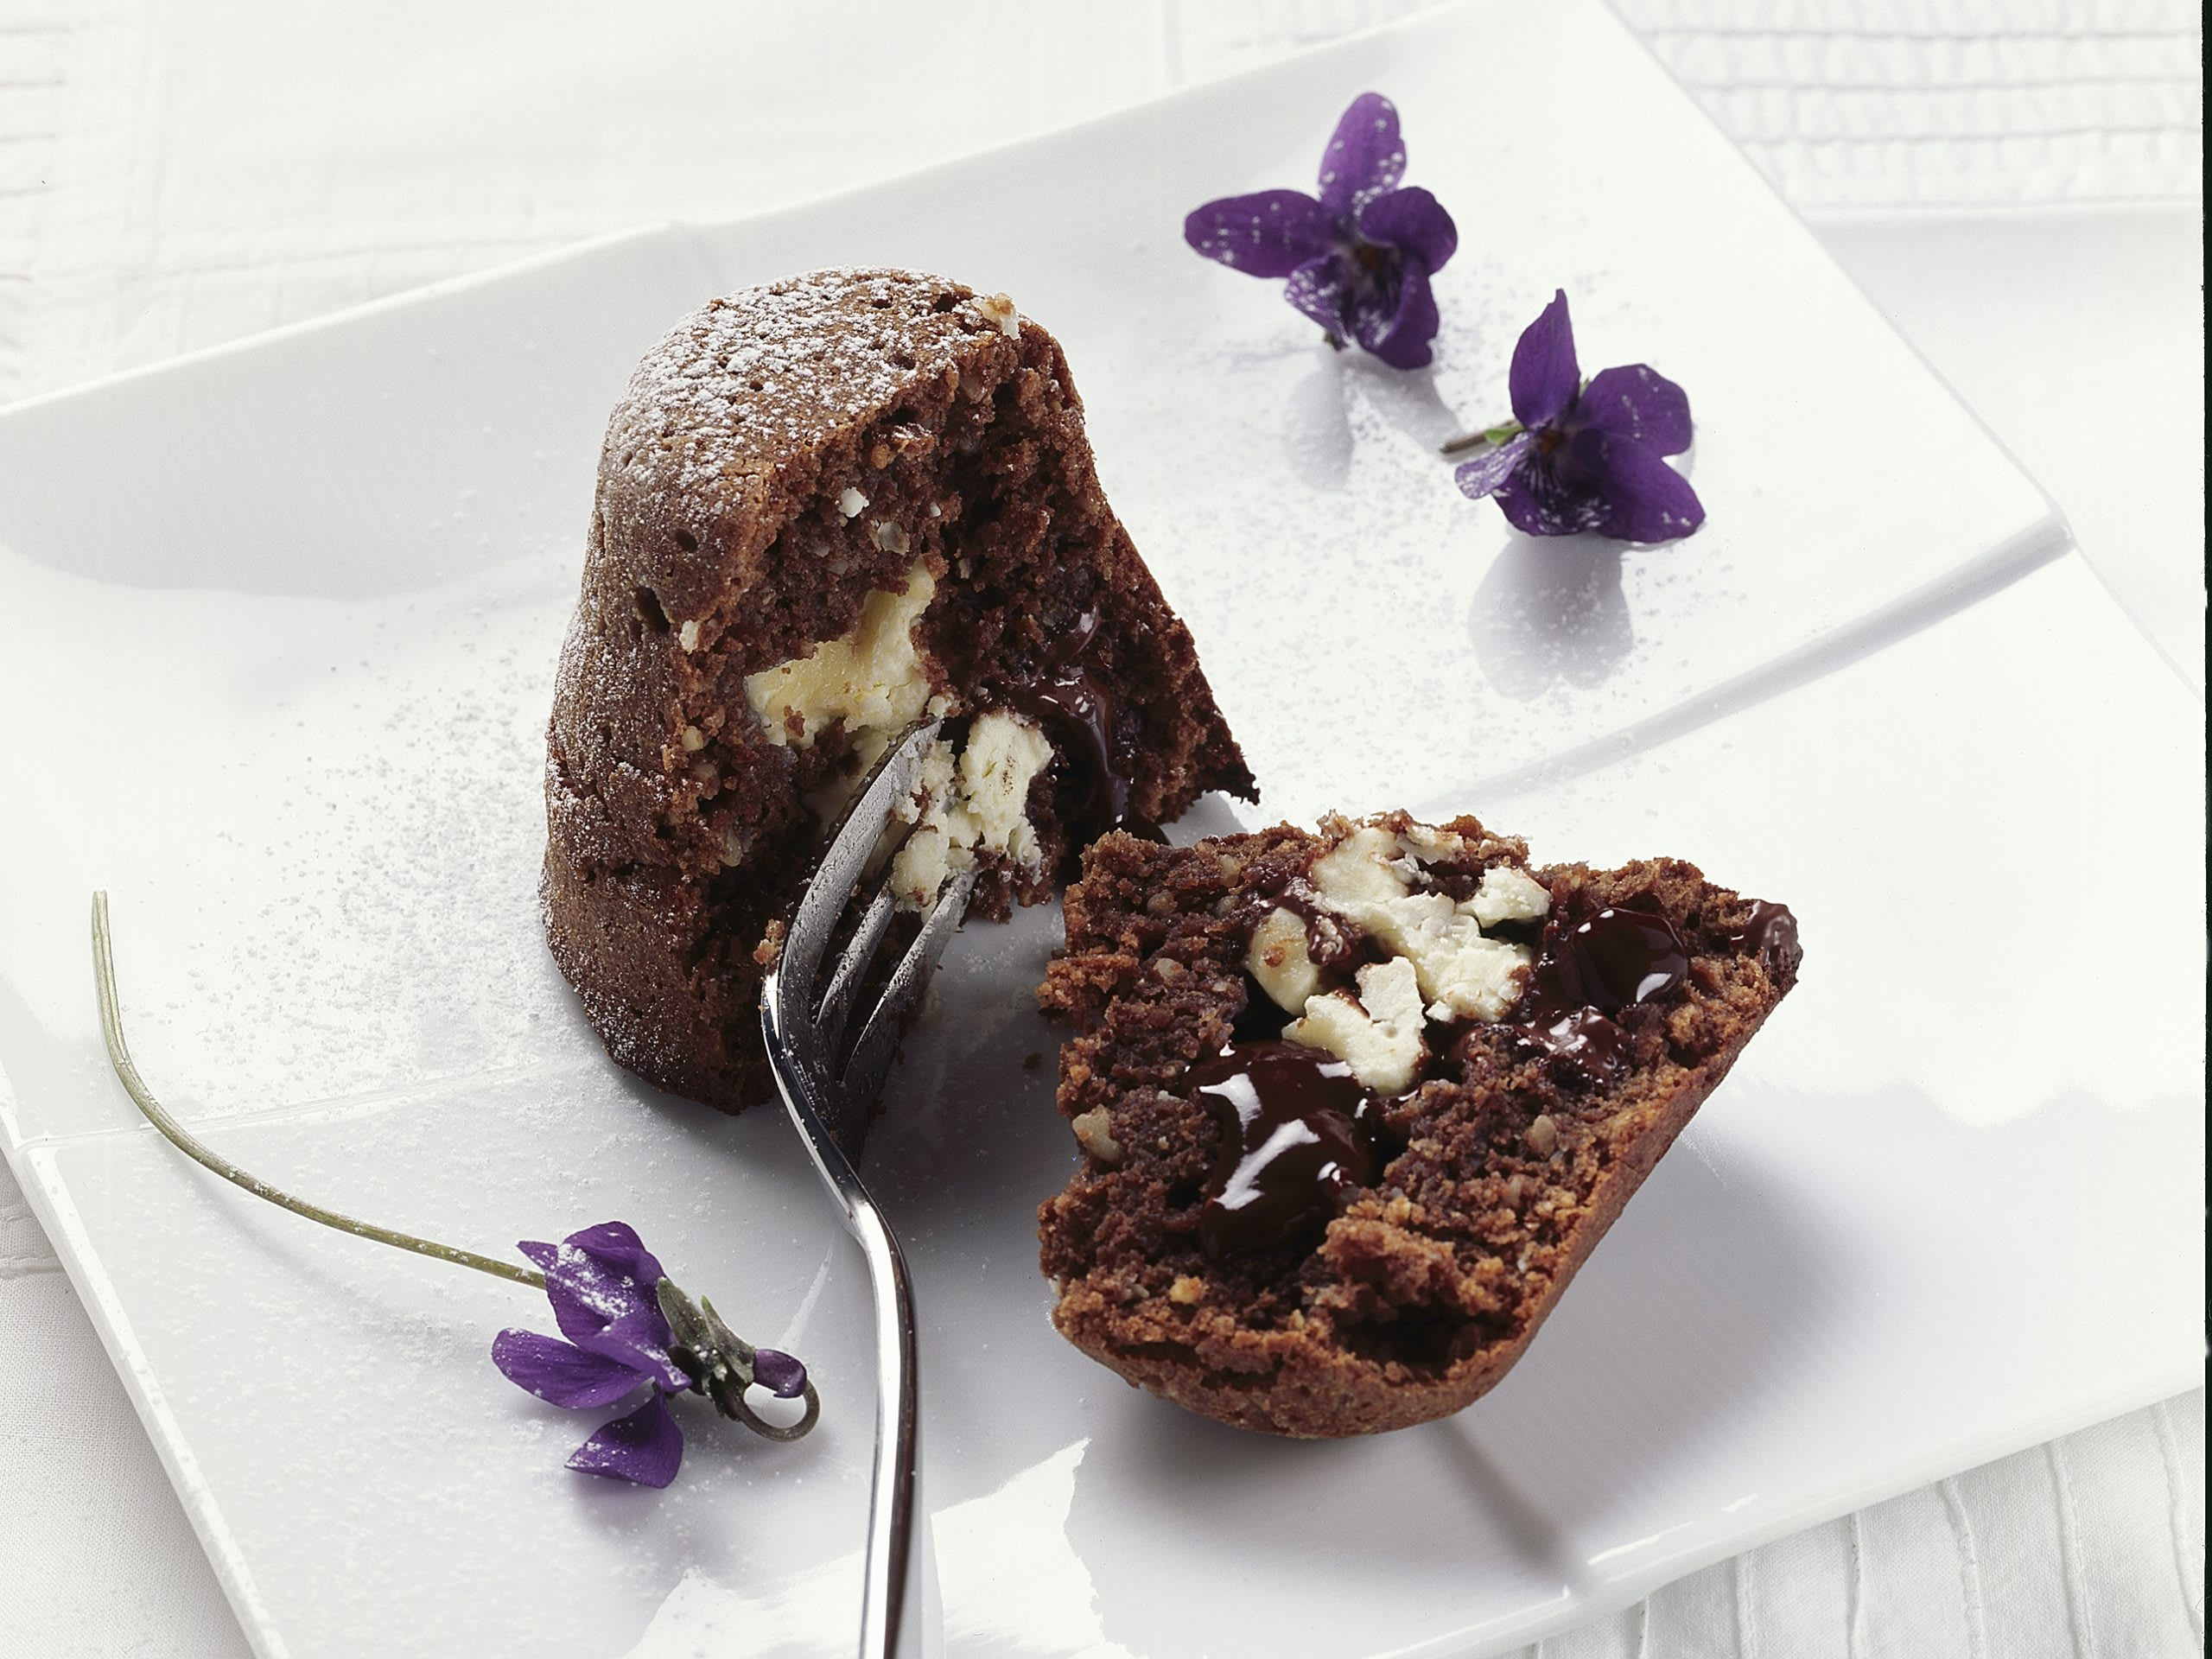 Timbale surprise au chocolat